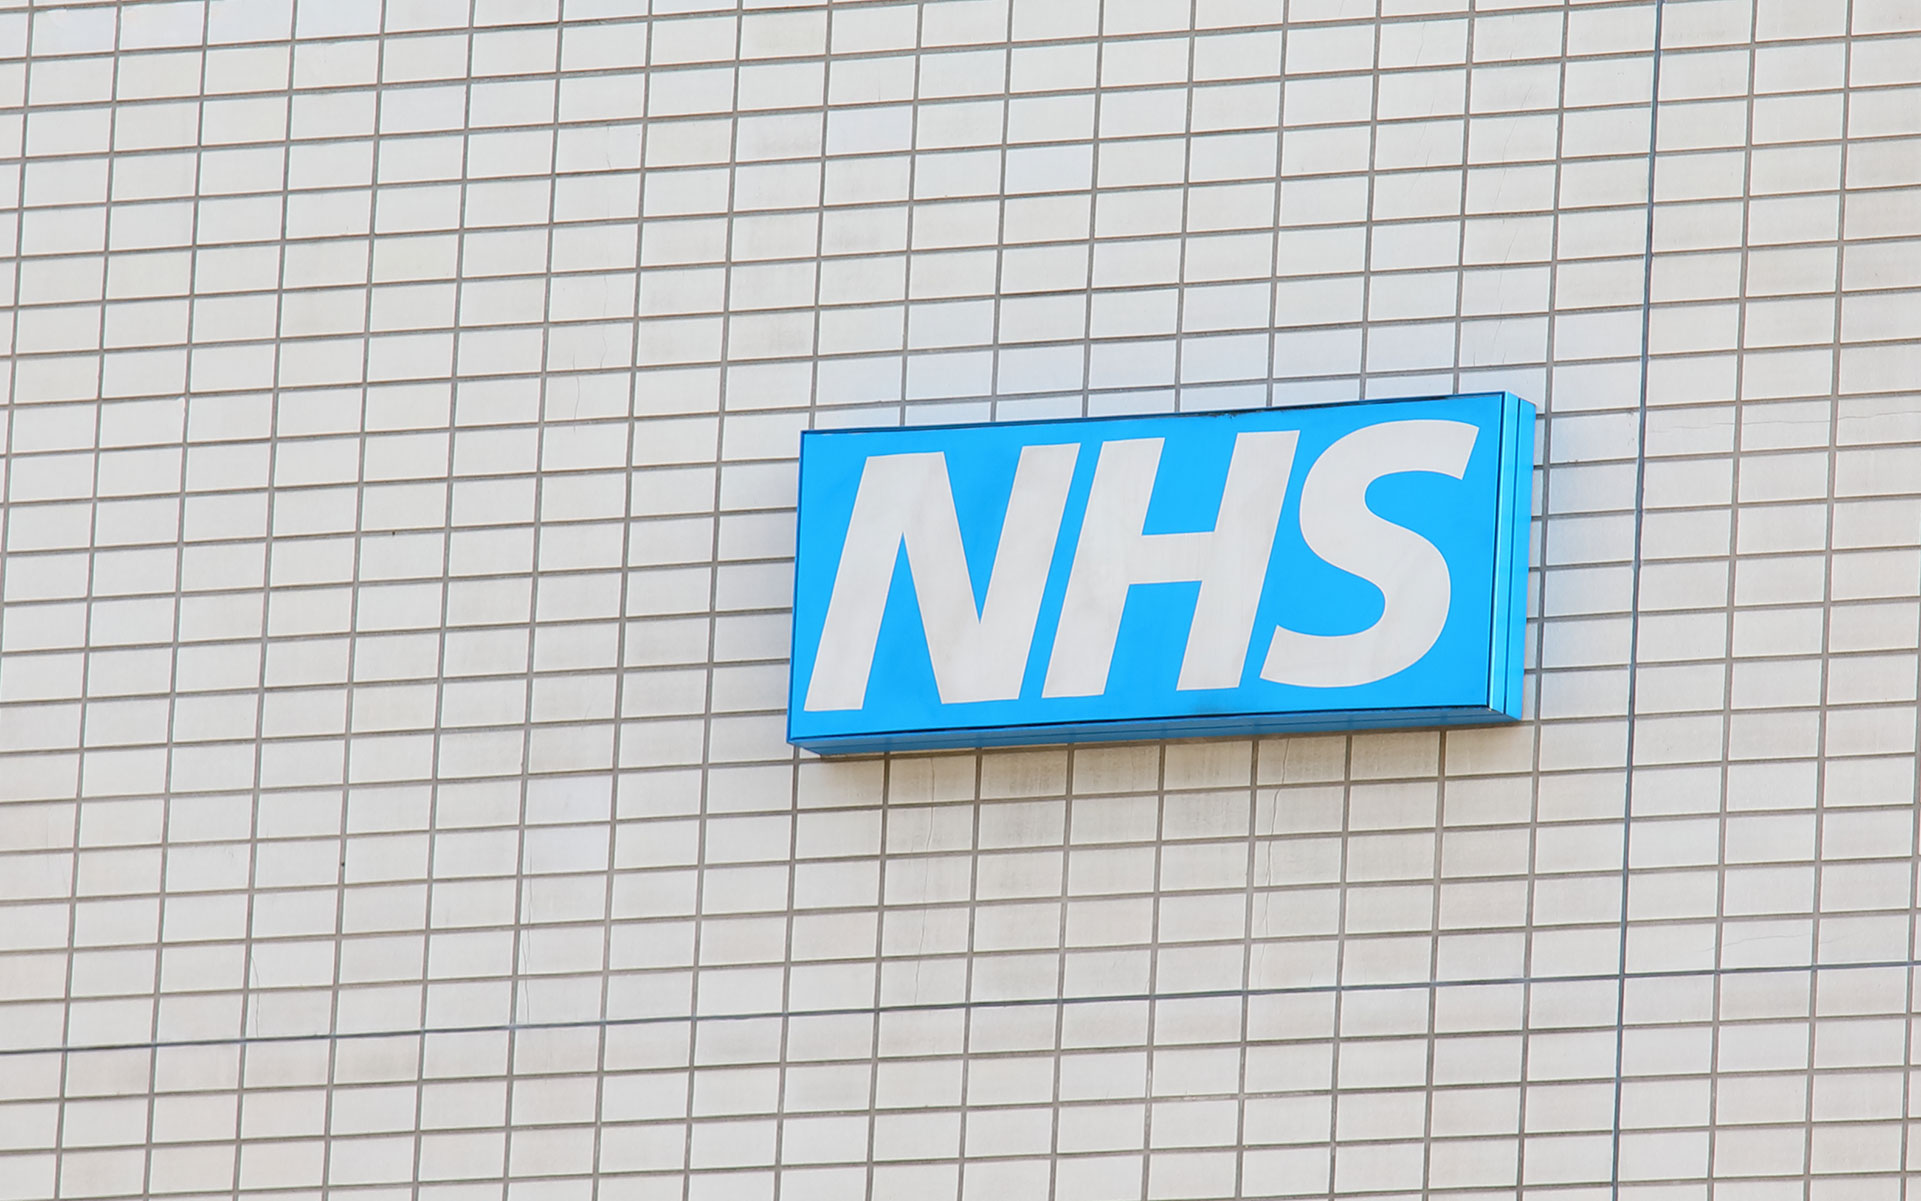 National Health Service UK